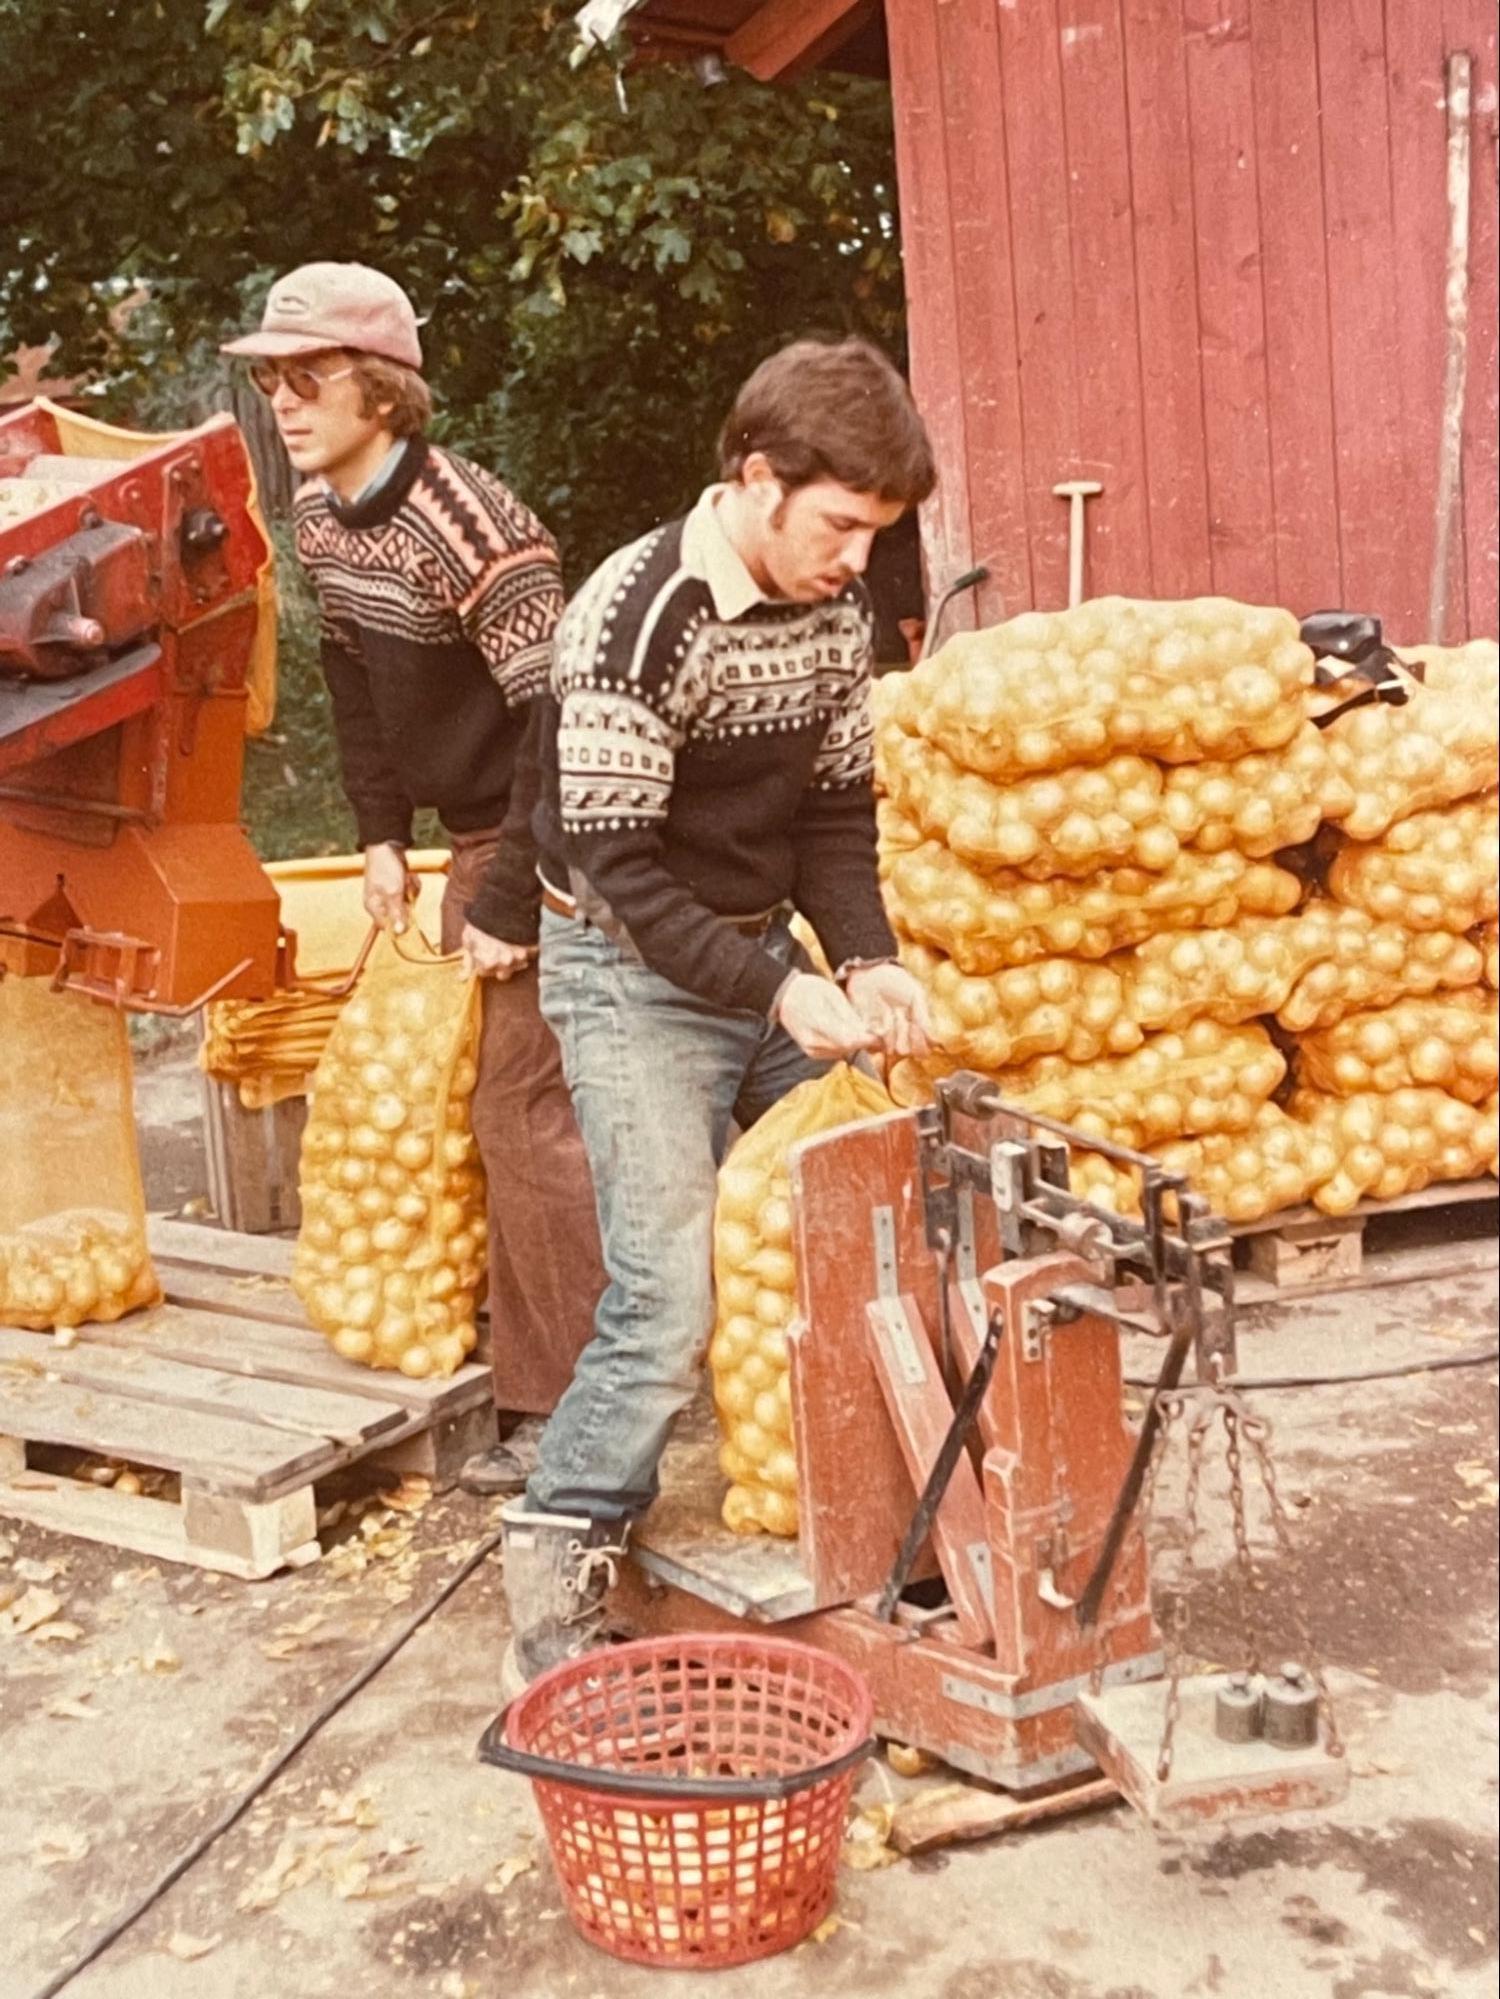 Onion season in Larvik